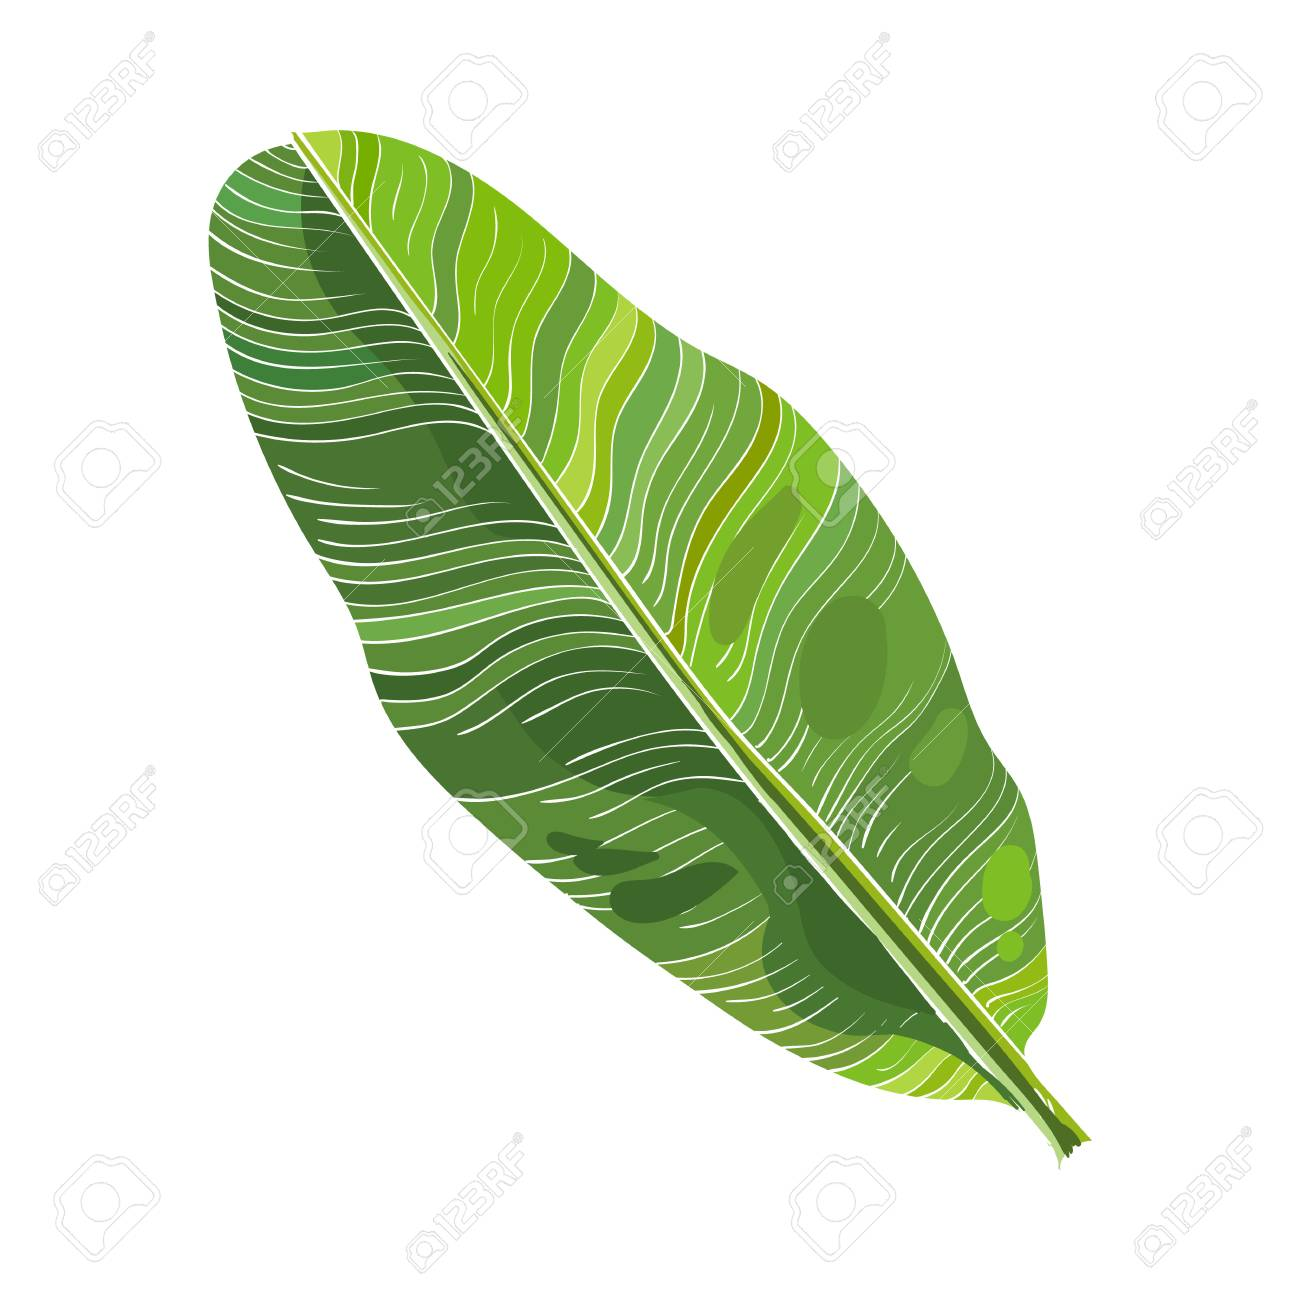 1300x1300 Full Fresh Leaf Of Banana Palm Tree, Vector Illustration Isolated